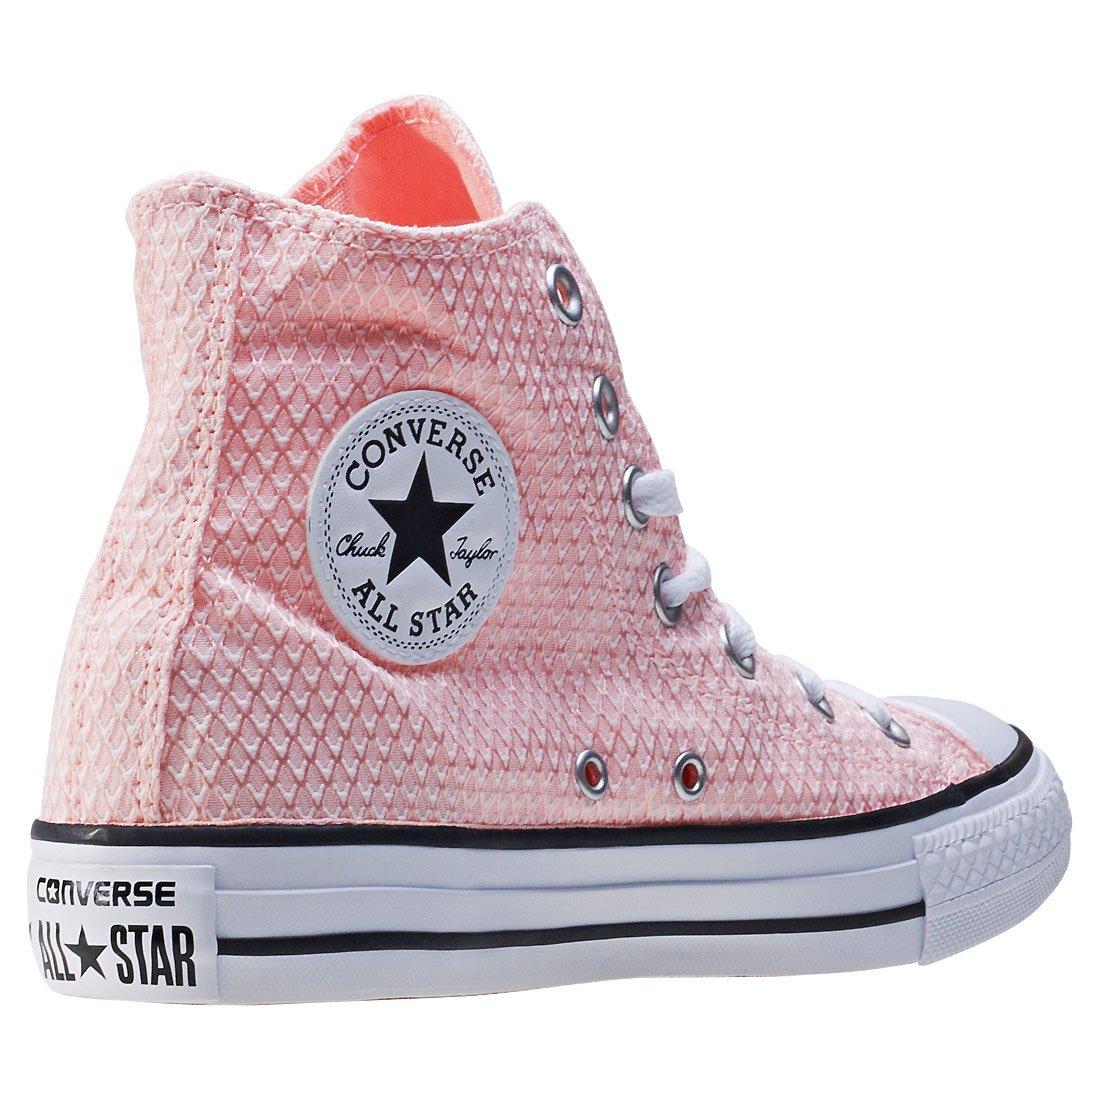 Converse Damen Ctas Pink Hi Sneakers Pink Ctas 637f05